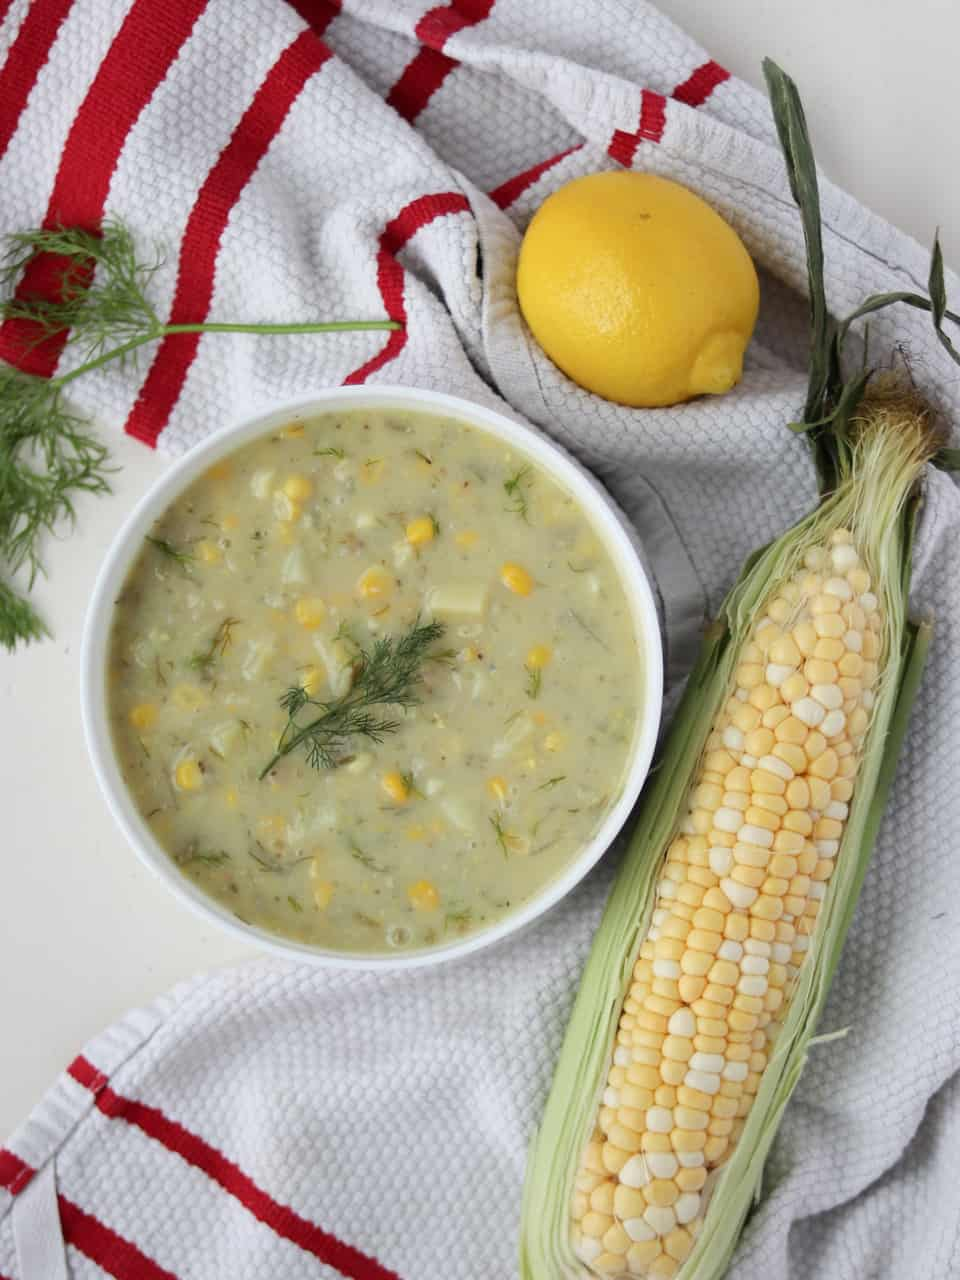 lemony sweet corn chowder overhead